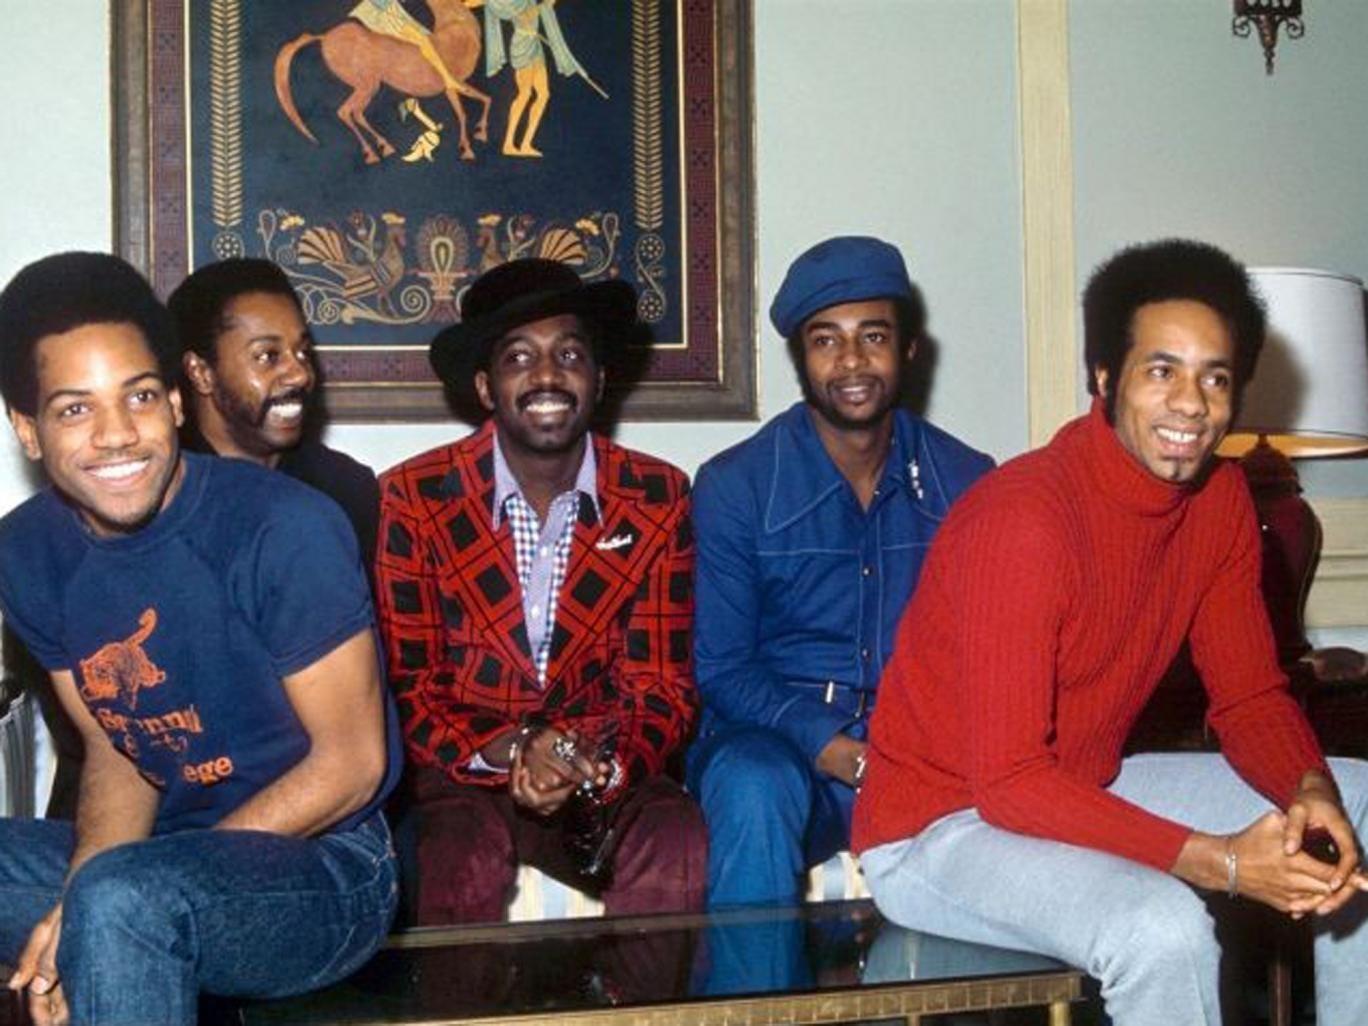 Harris (far left) with Melvin Franklin, Otis Williams, Dennis Edwards and Richard Street in 1972